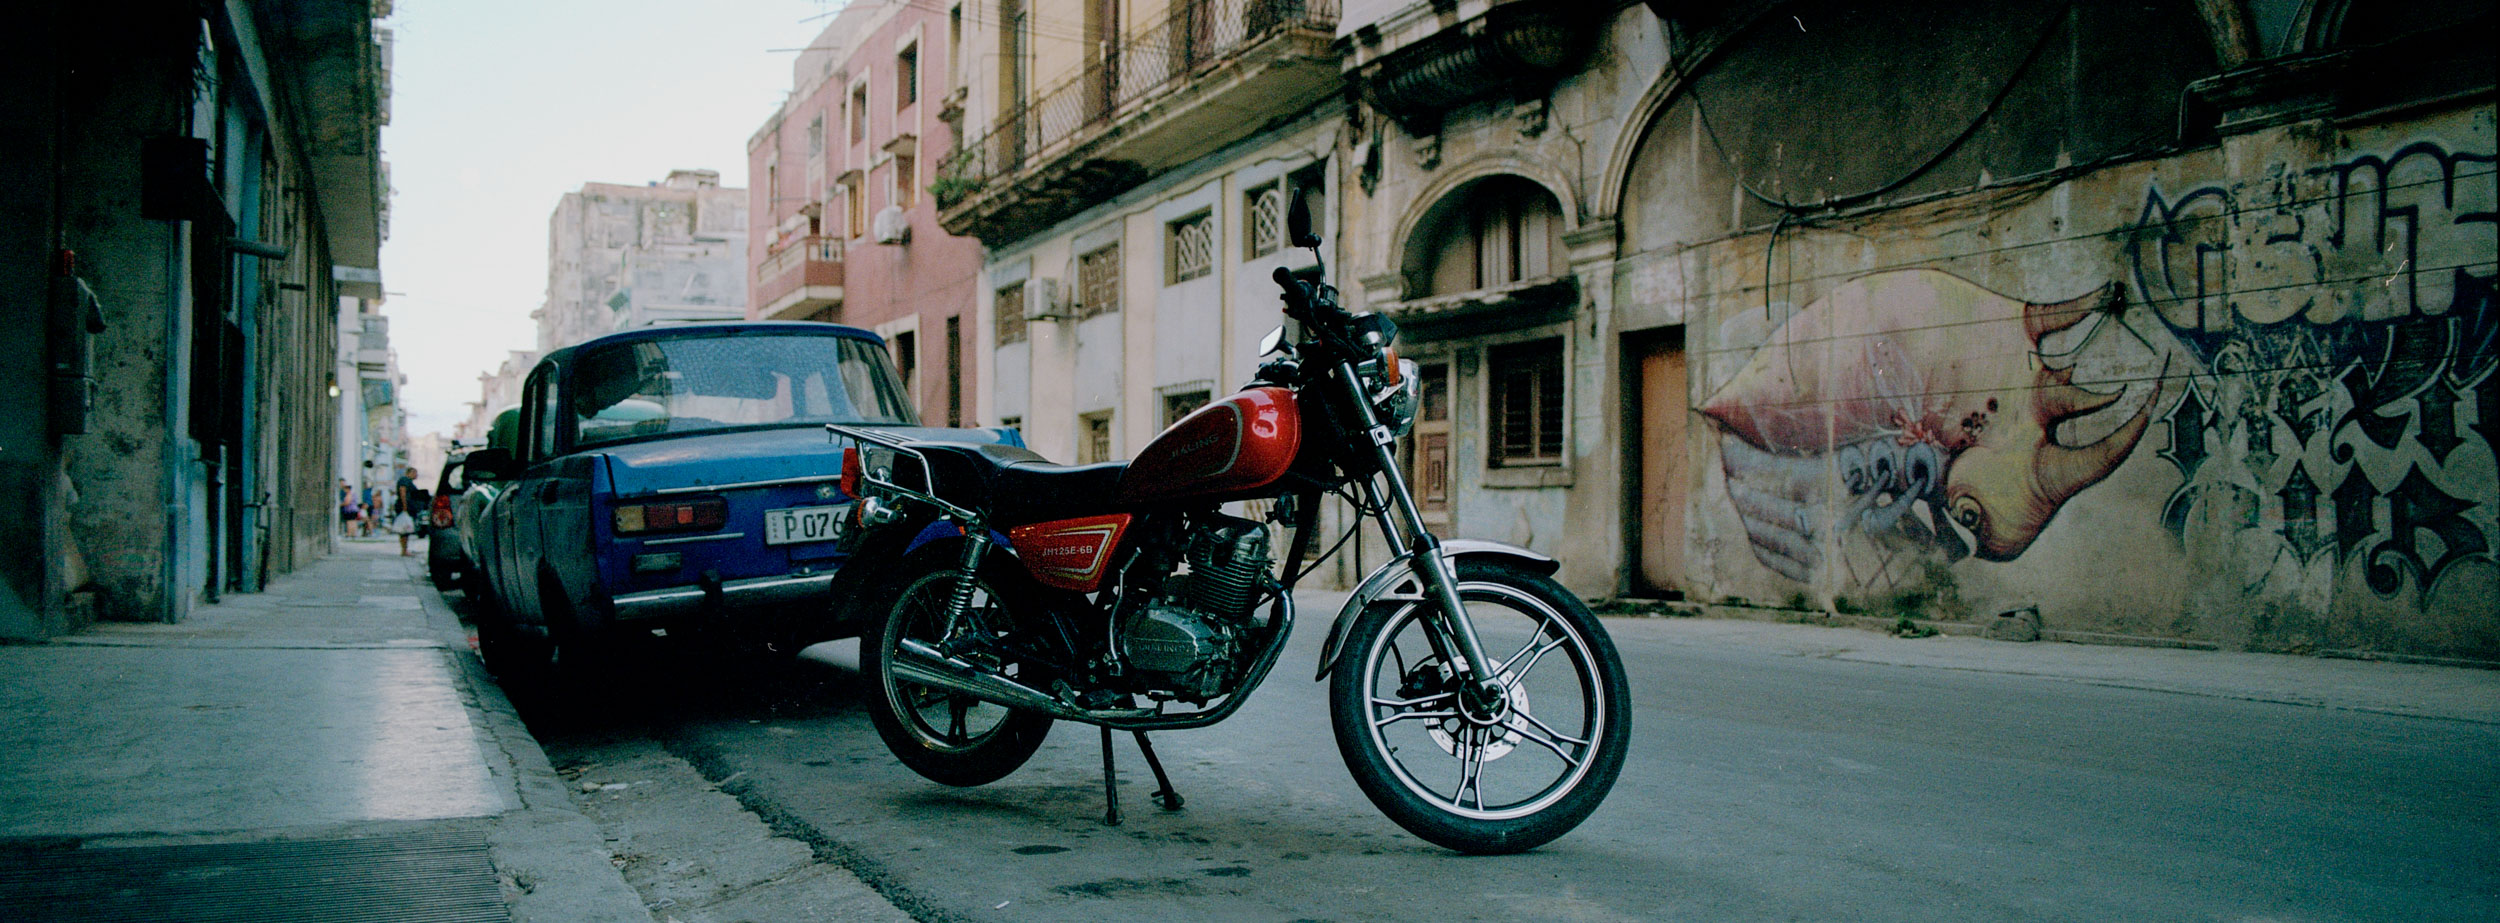 JackMcKain_Havana-324.jpg